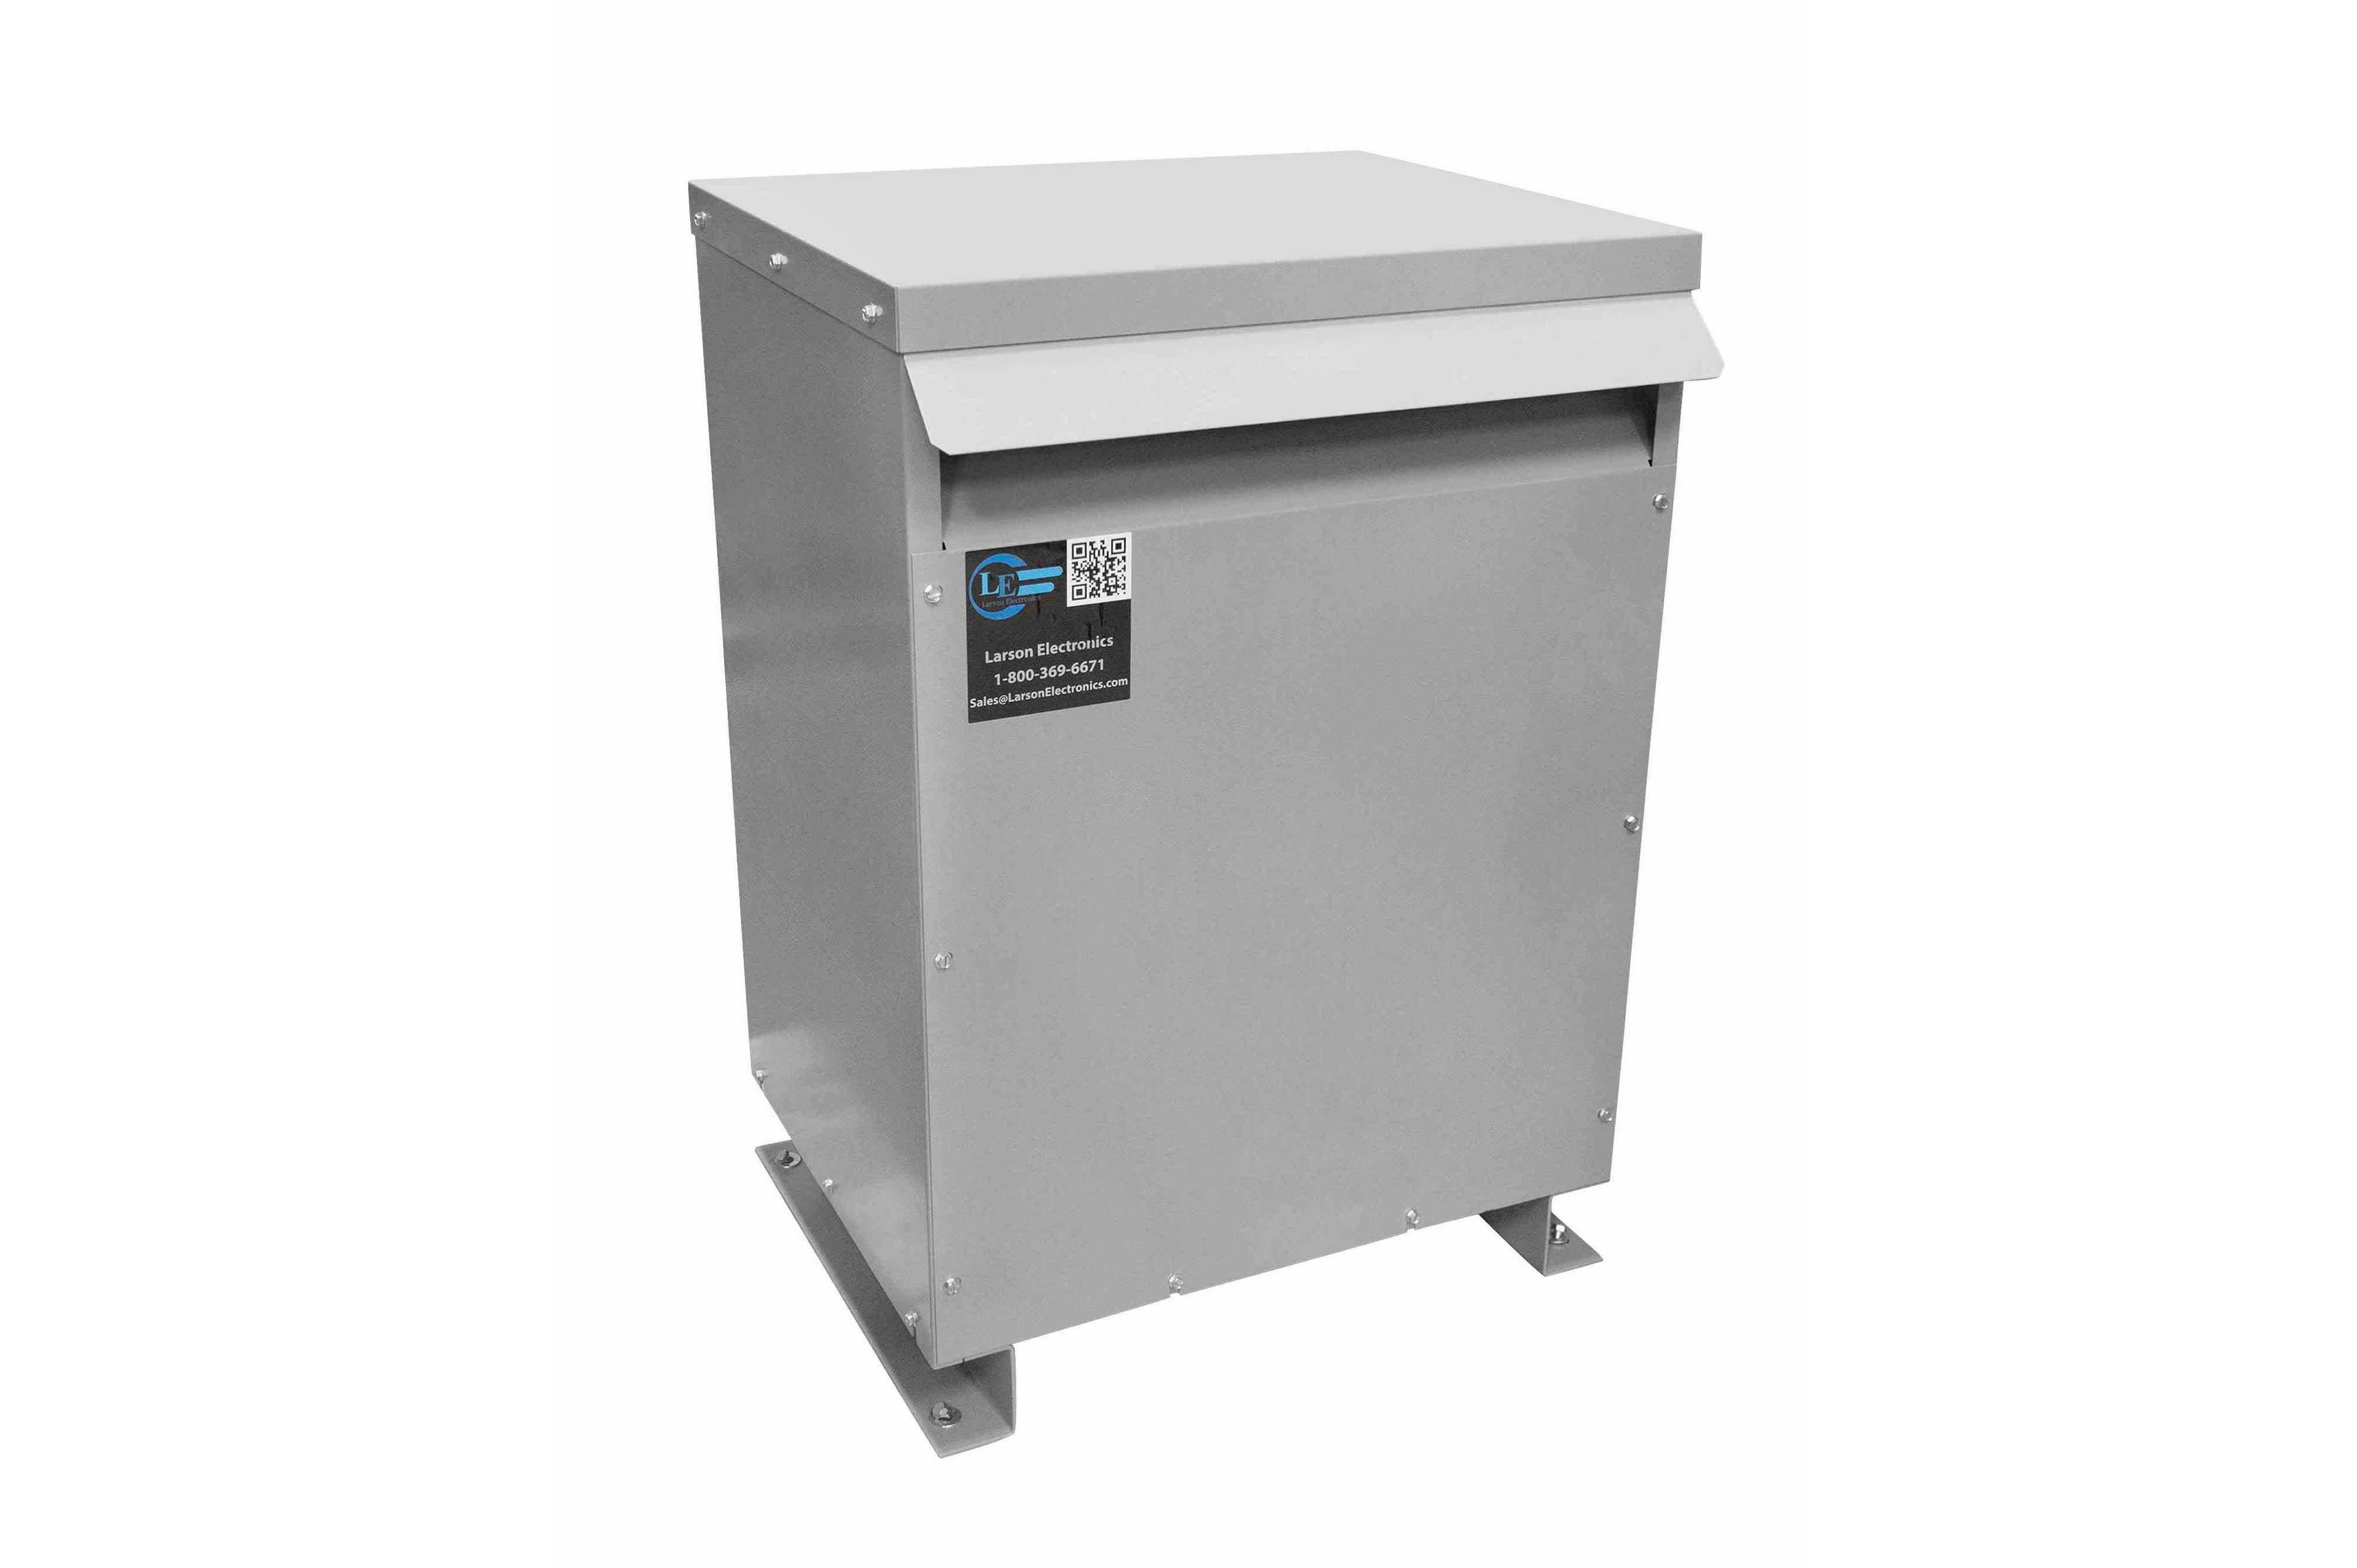 80 kVA 3PH DOE Transformer, 415V Delta Primary, 480Y/277 Wye-N Secondary, N3R, Ventilated, 60 Hz